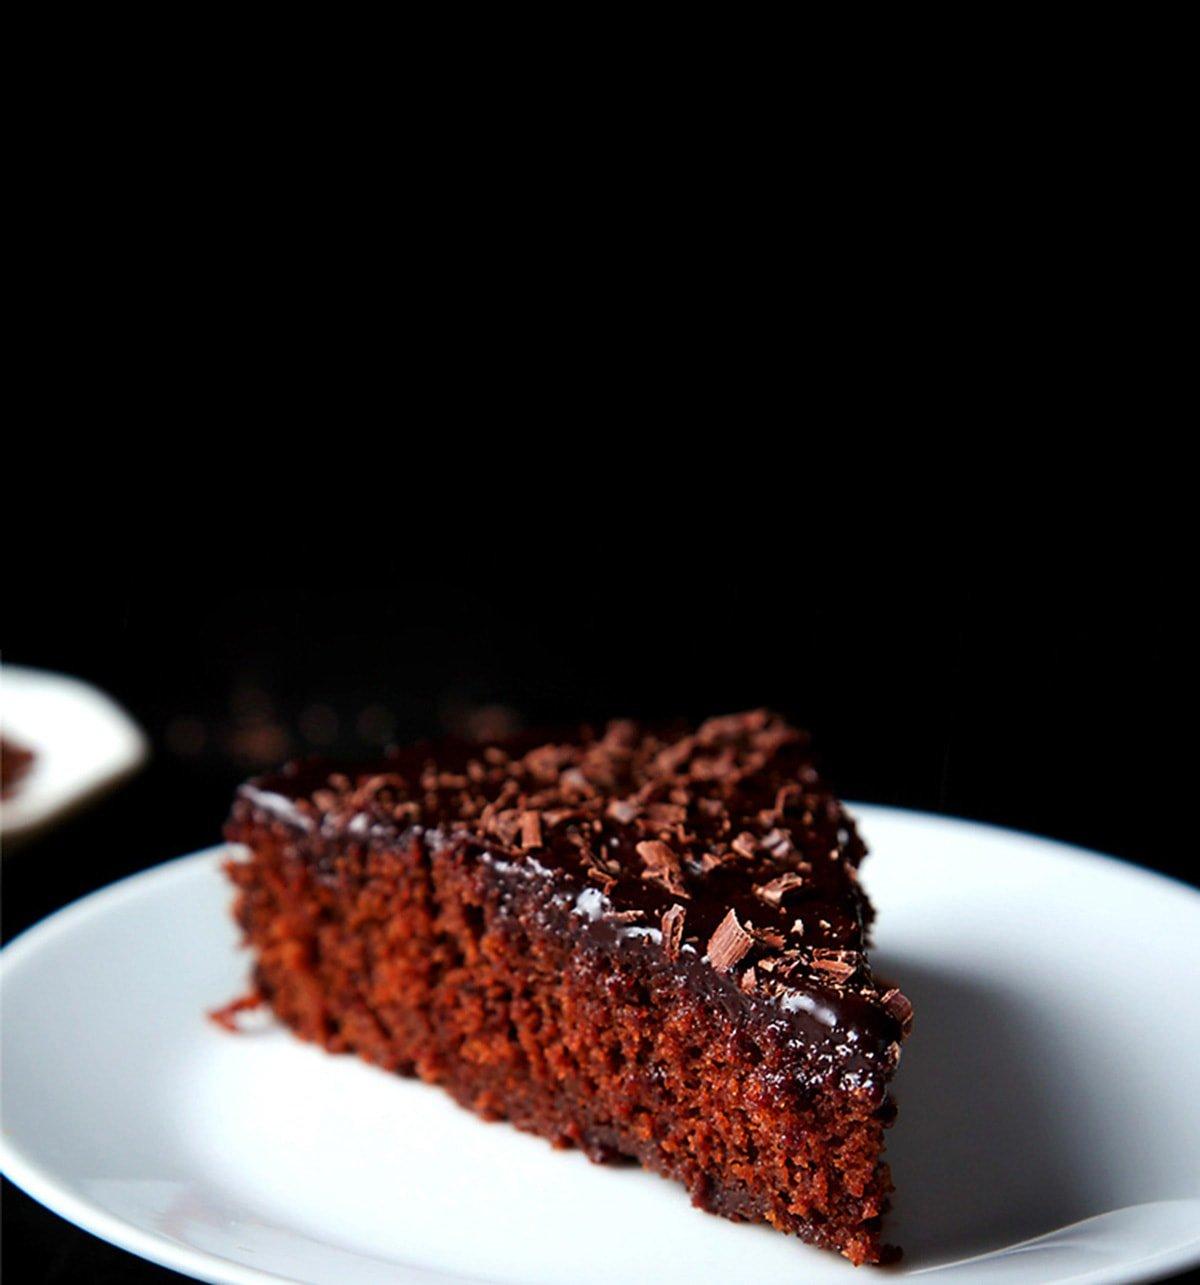 A triangular wedge of eggless chocolate cake on a white plate